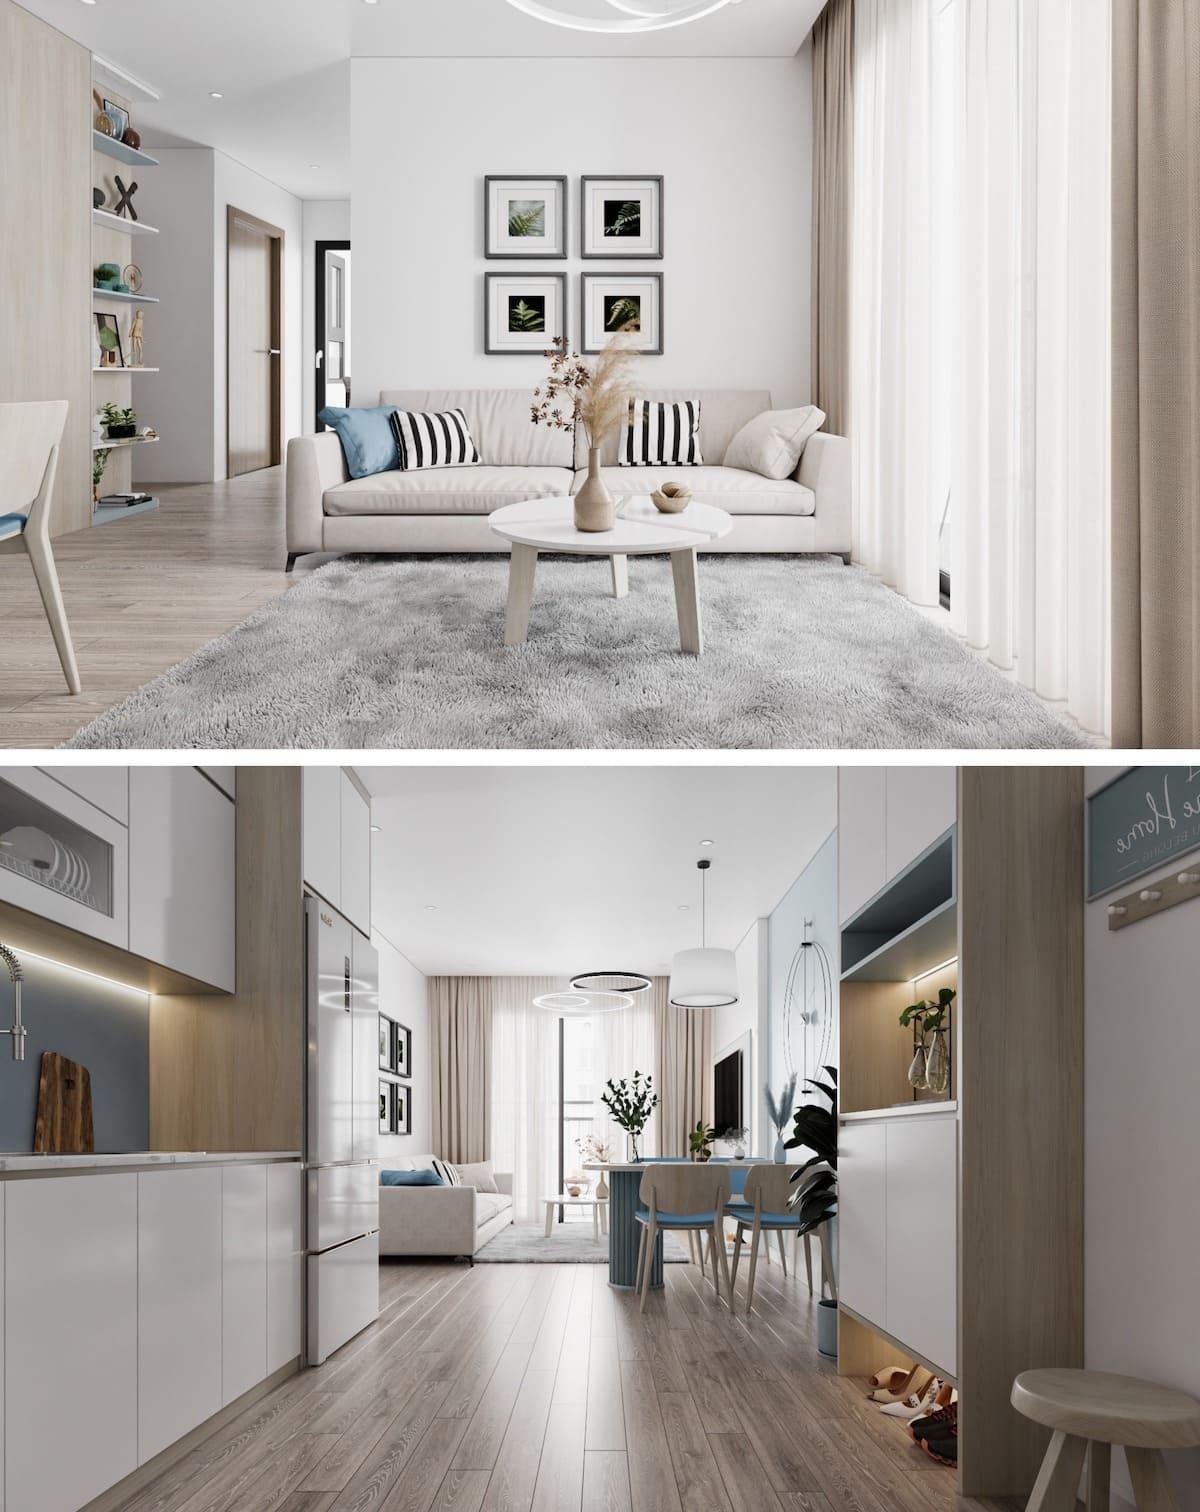 дизайн интерьера модной квартиры фото 81